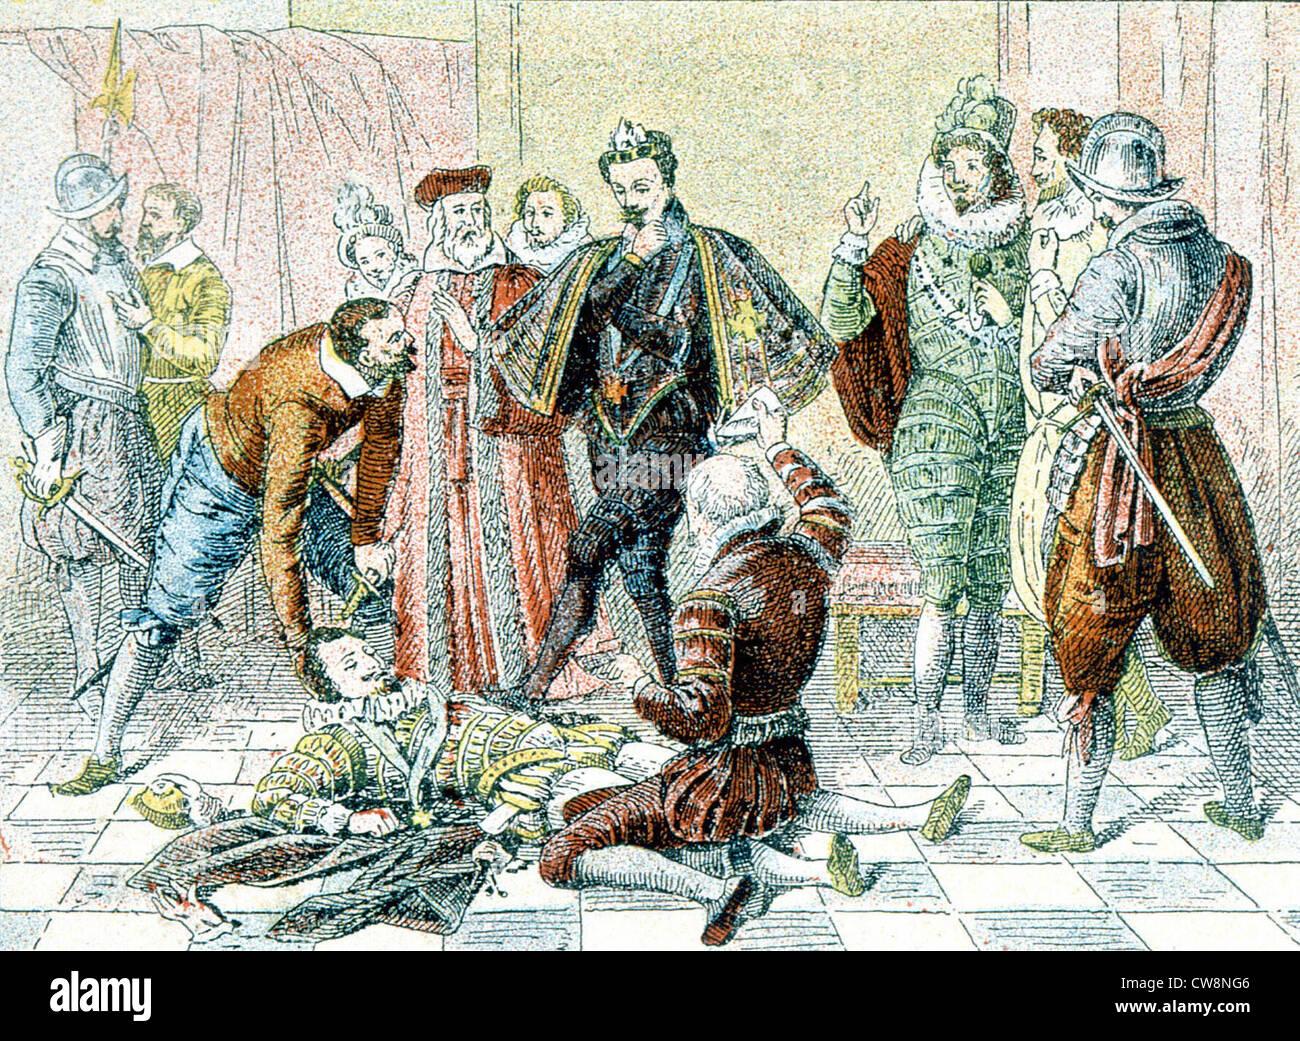 Duke of Guise, illustrations - Stock Image